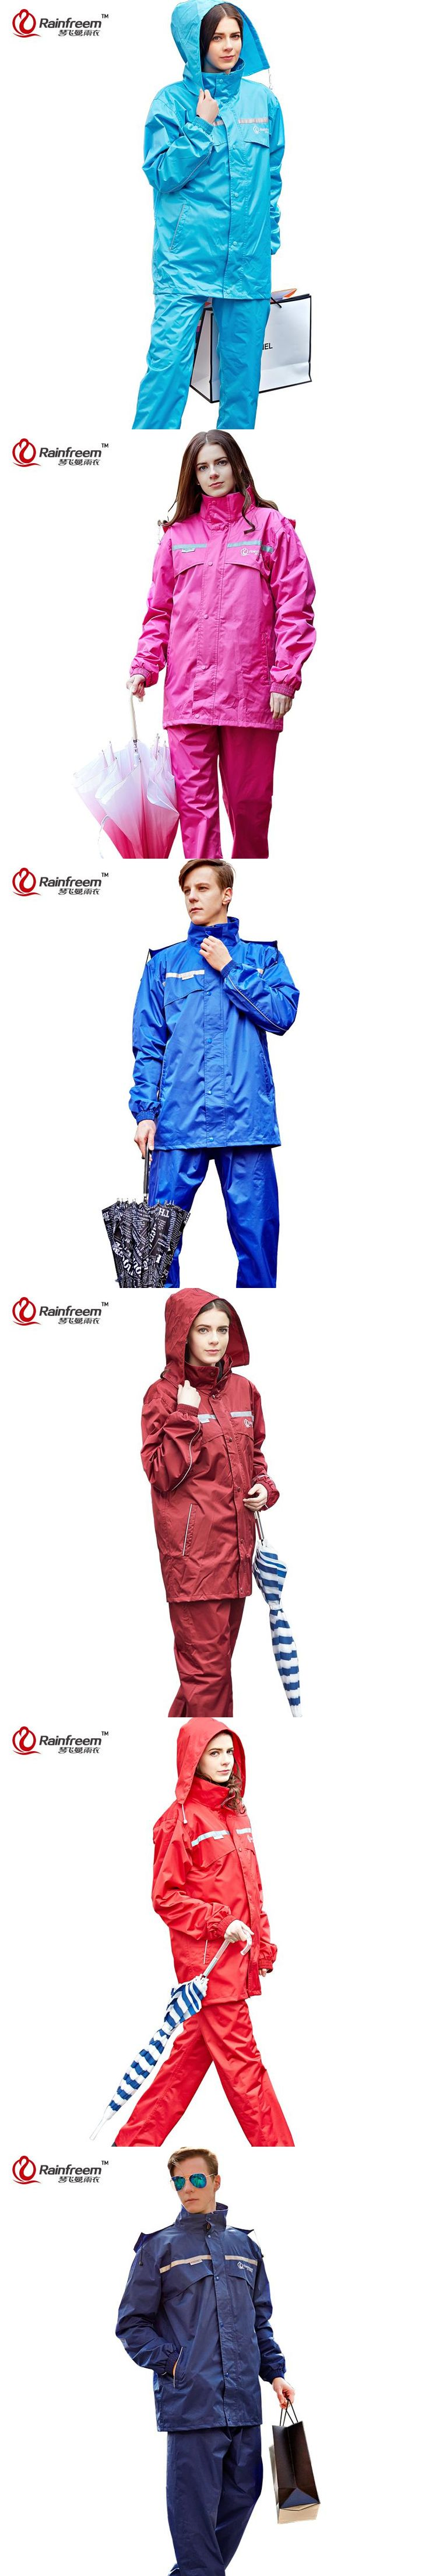 Rainfreem Impermeable Raincoat Women/Men Hood Rain Poncho Waterproof Rain Jacket Pants Suit Rainwear Men Motorcycle Rain Gear